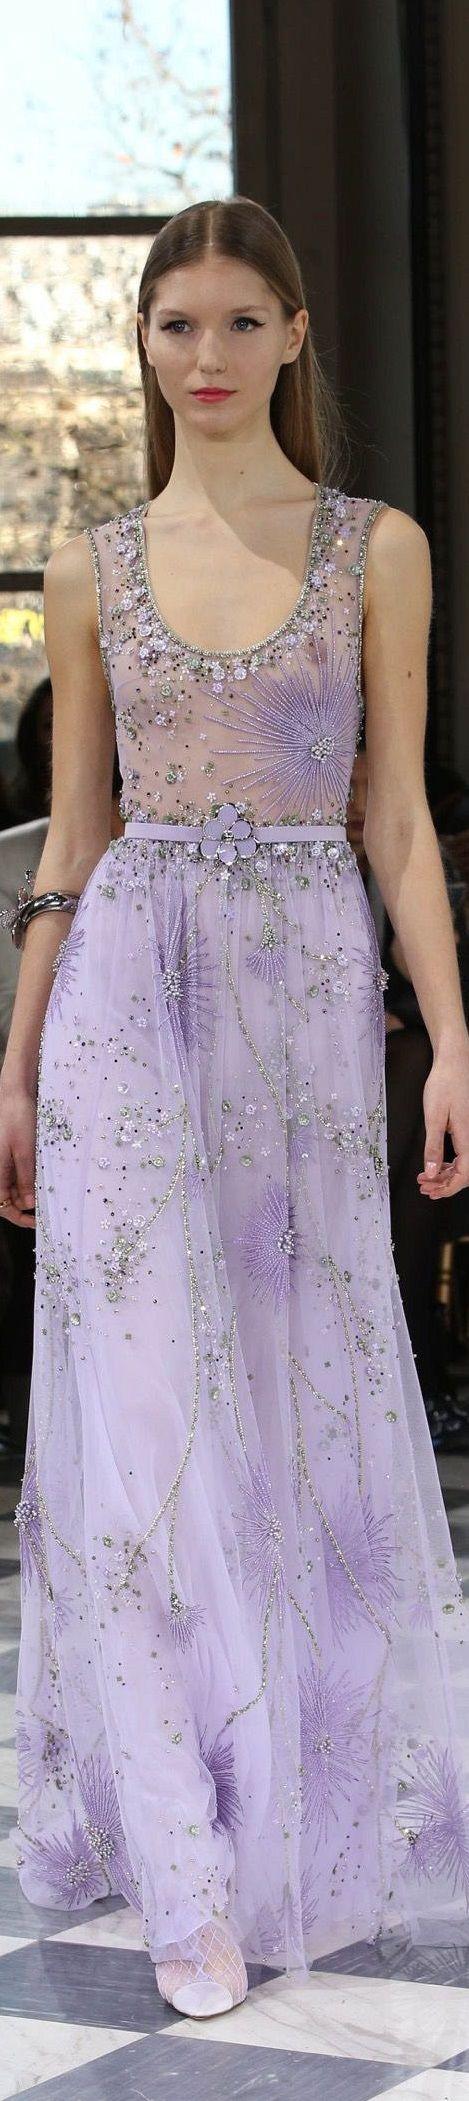 Georges Hobeika Spring 2016 Couture jαɢlαdy